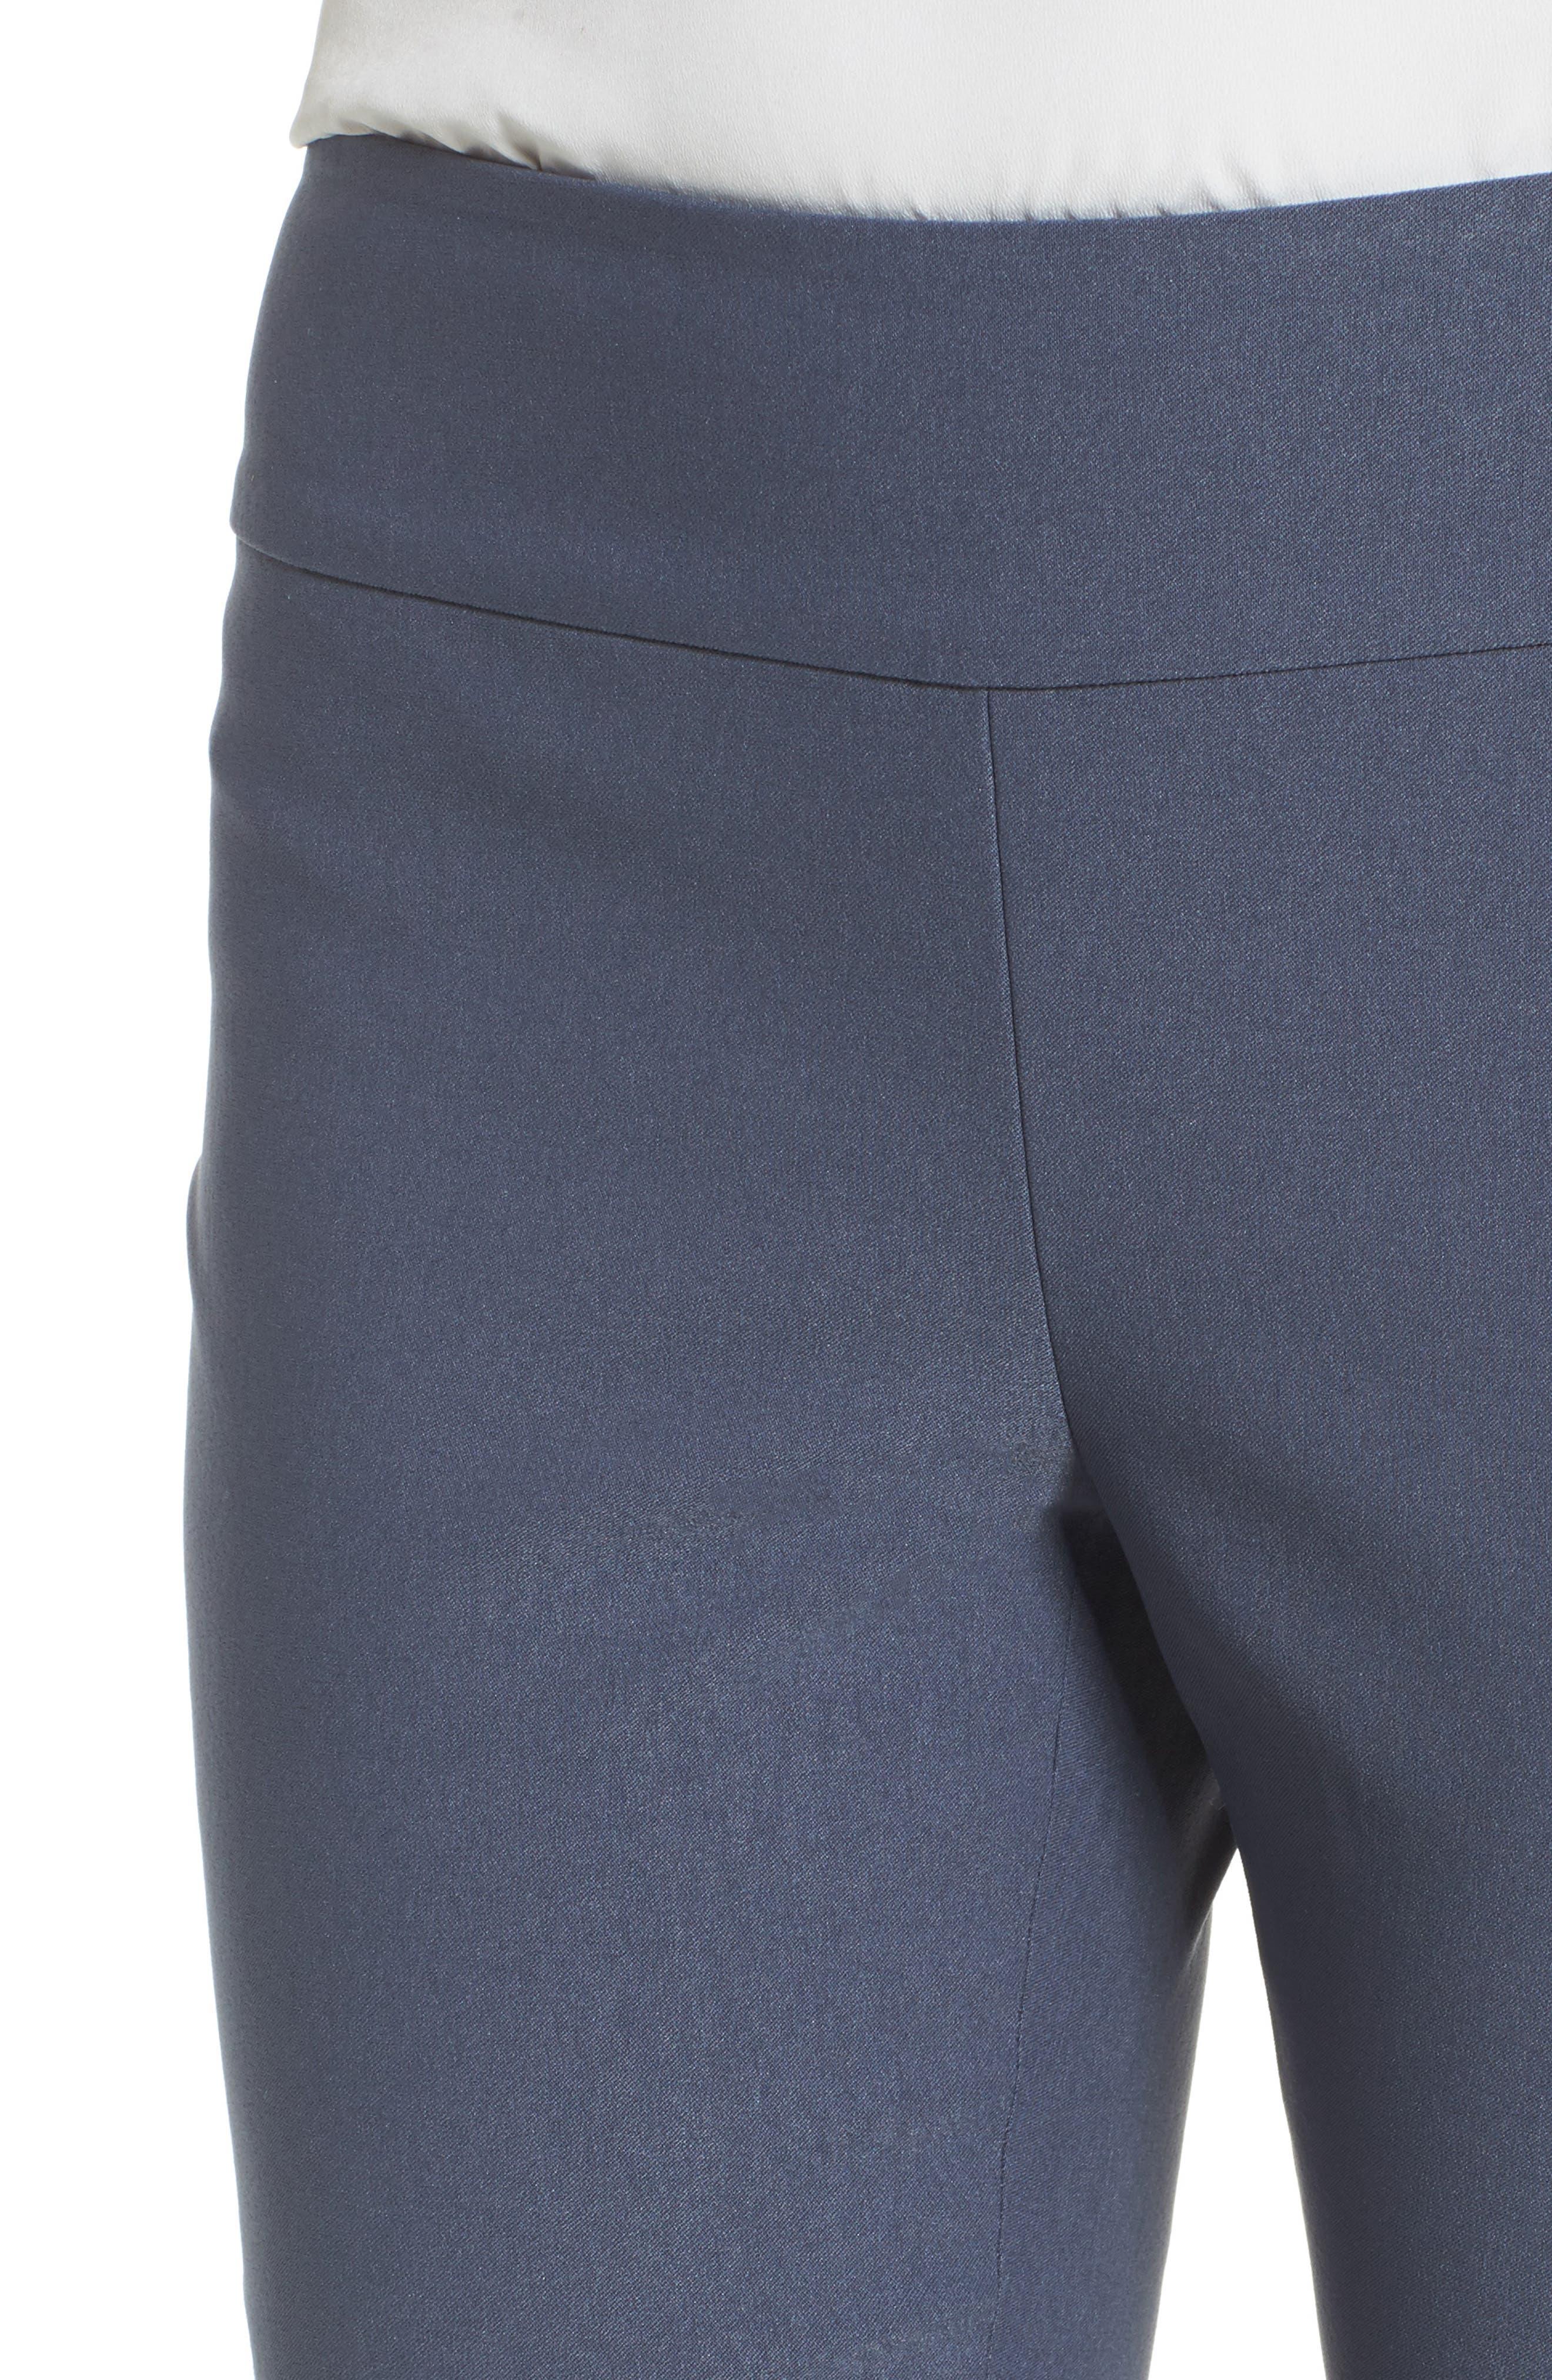 'The Wonder Stretch' Slim Leg Pants,                             Alternate thumbnail 44, color,